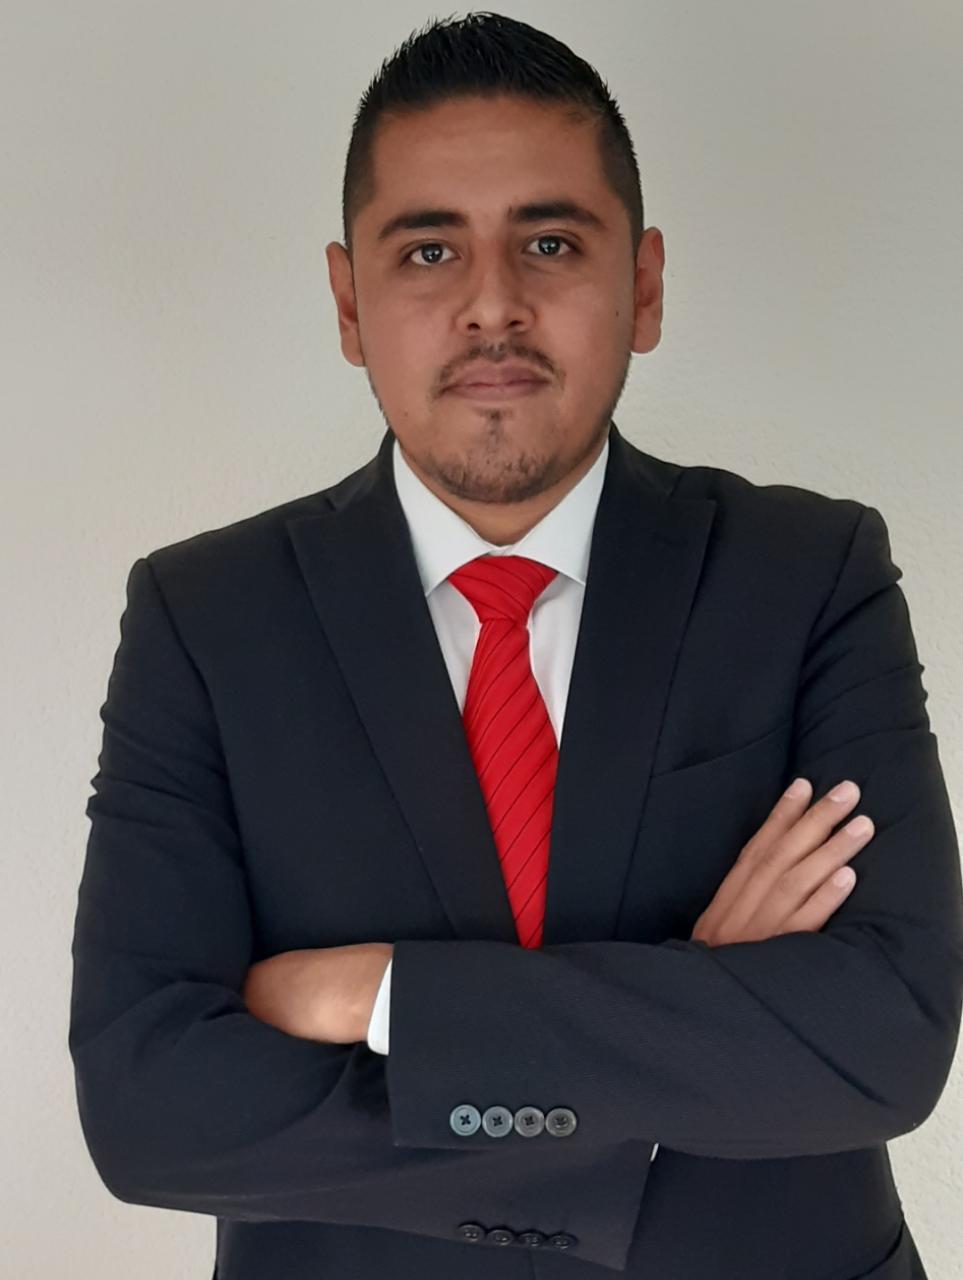 Daniel Villegas